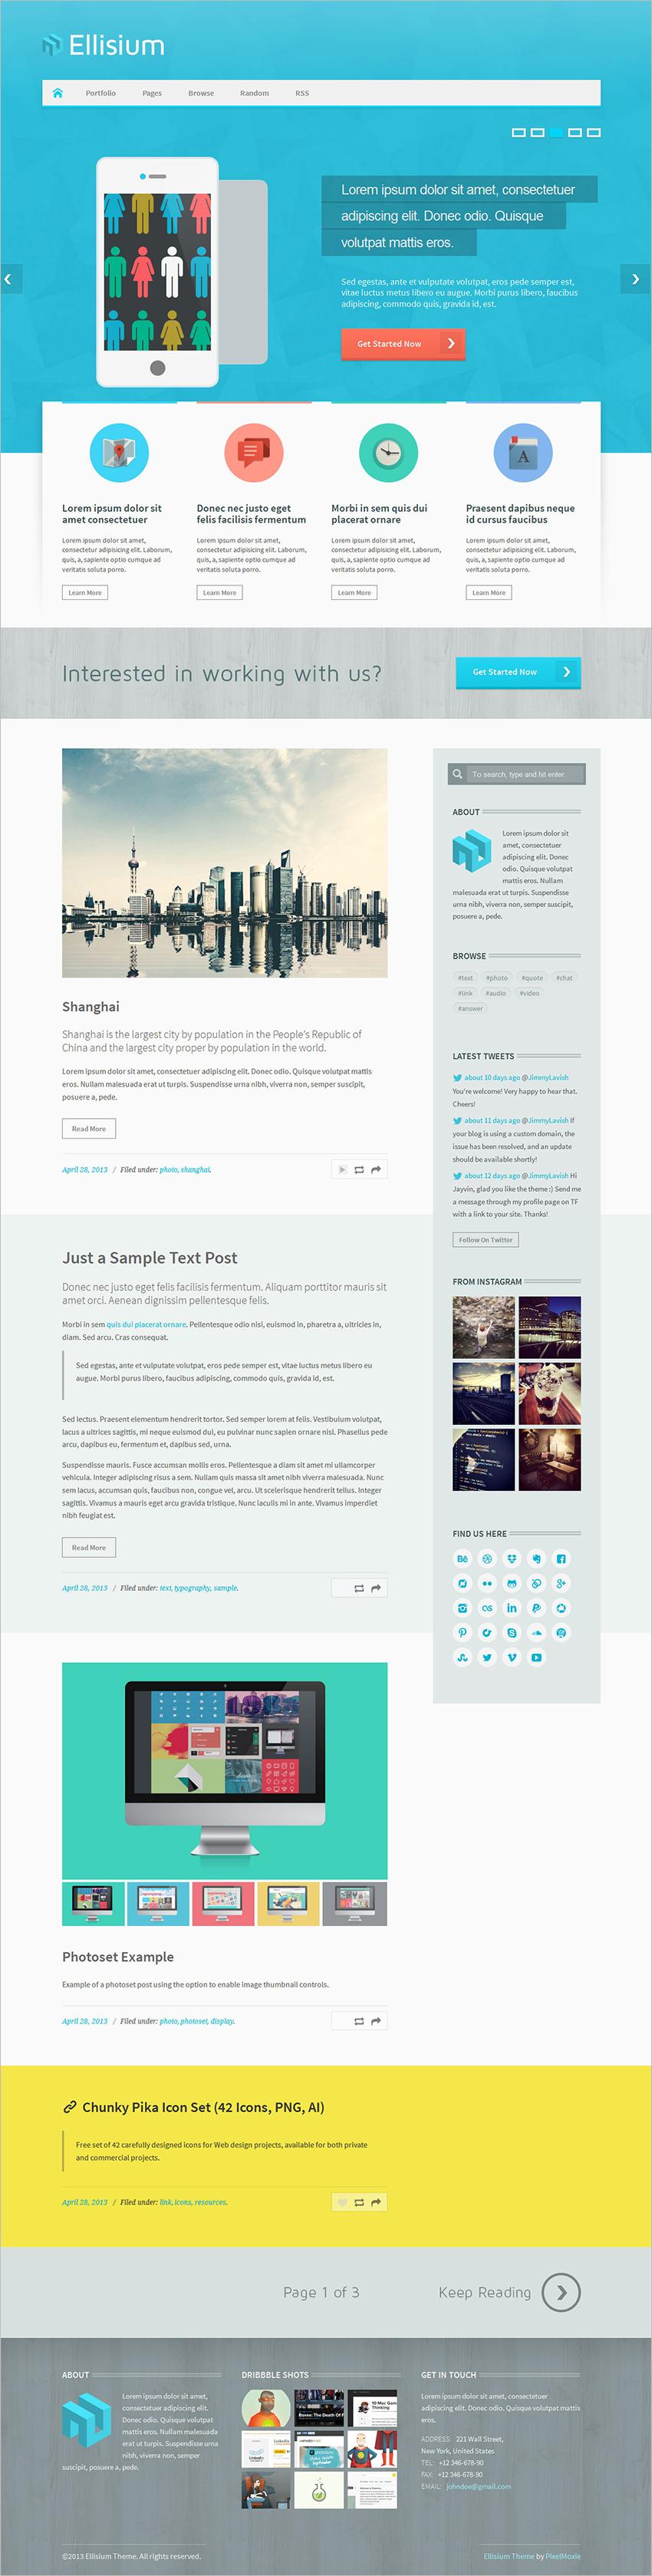 Business Blogging Tumblr Theme